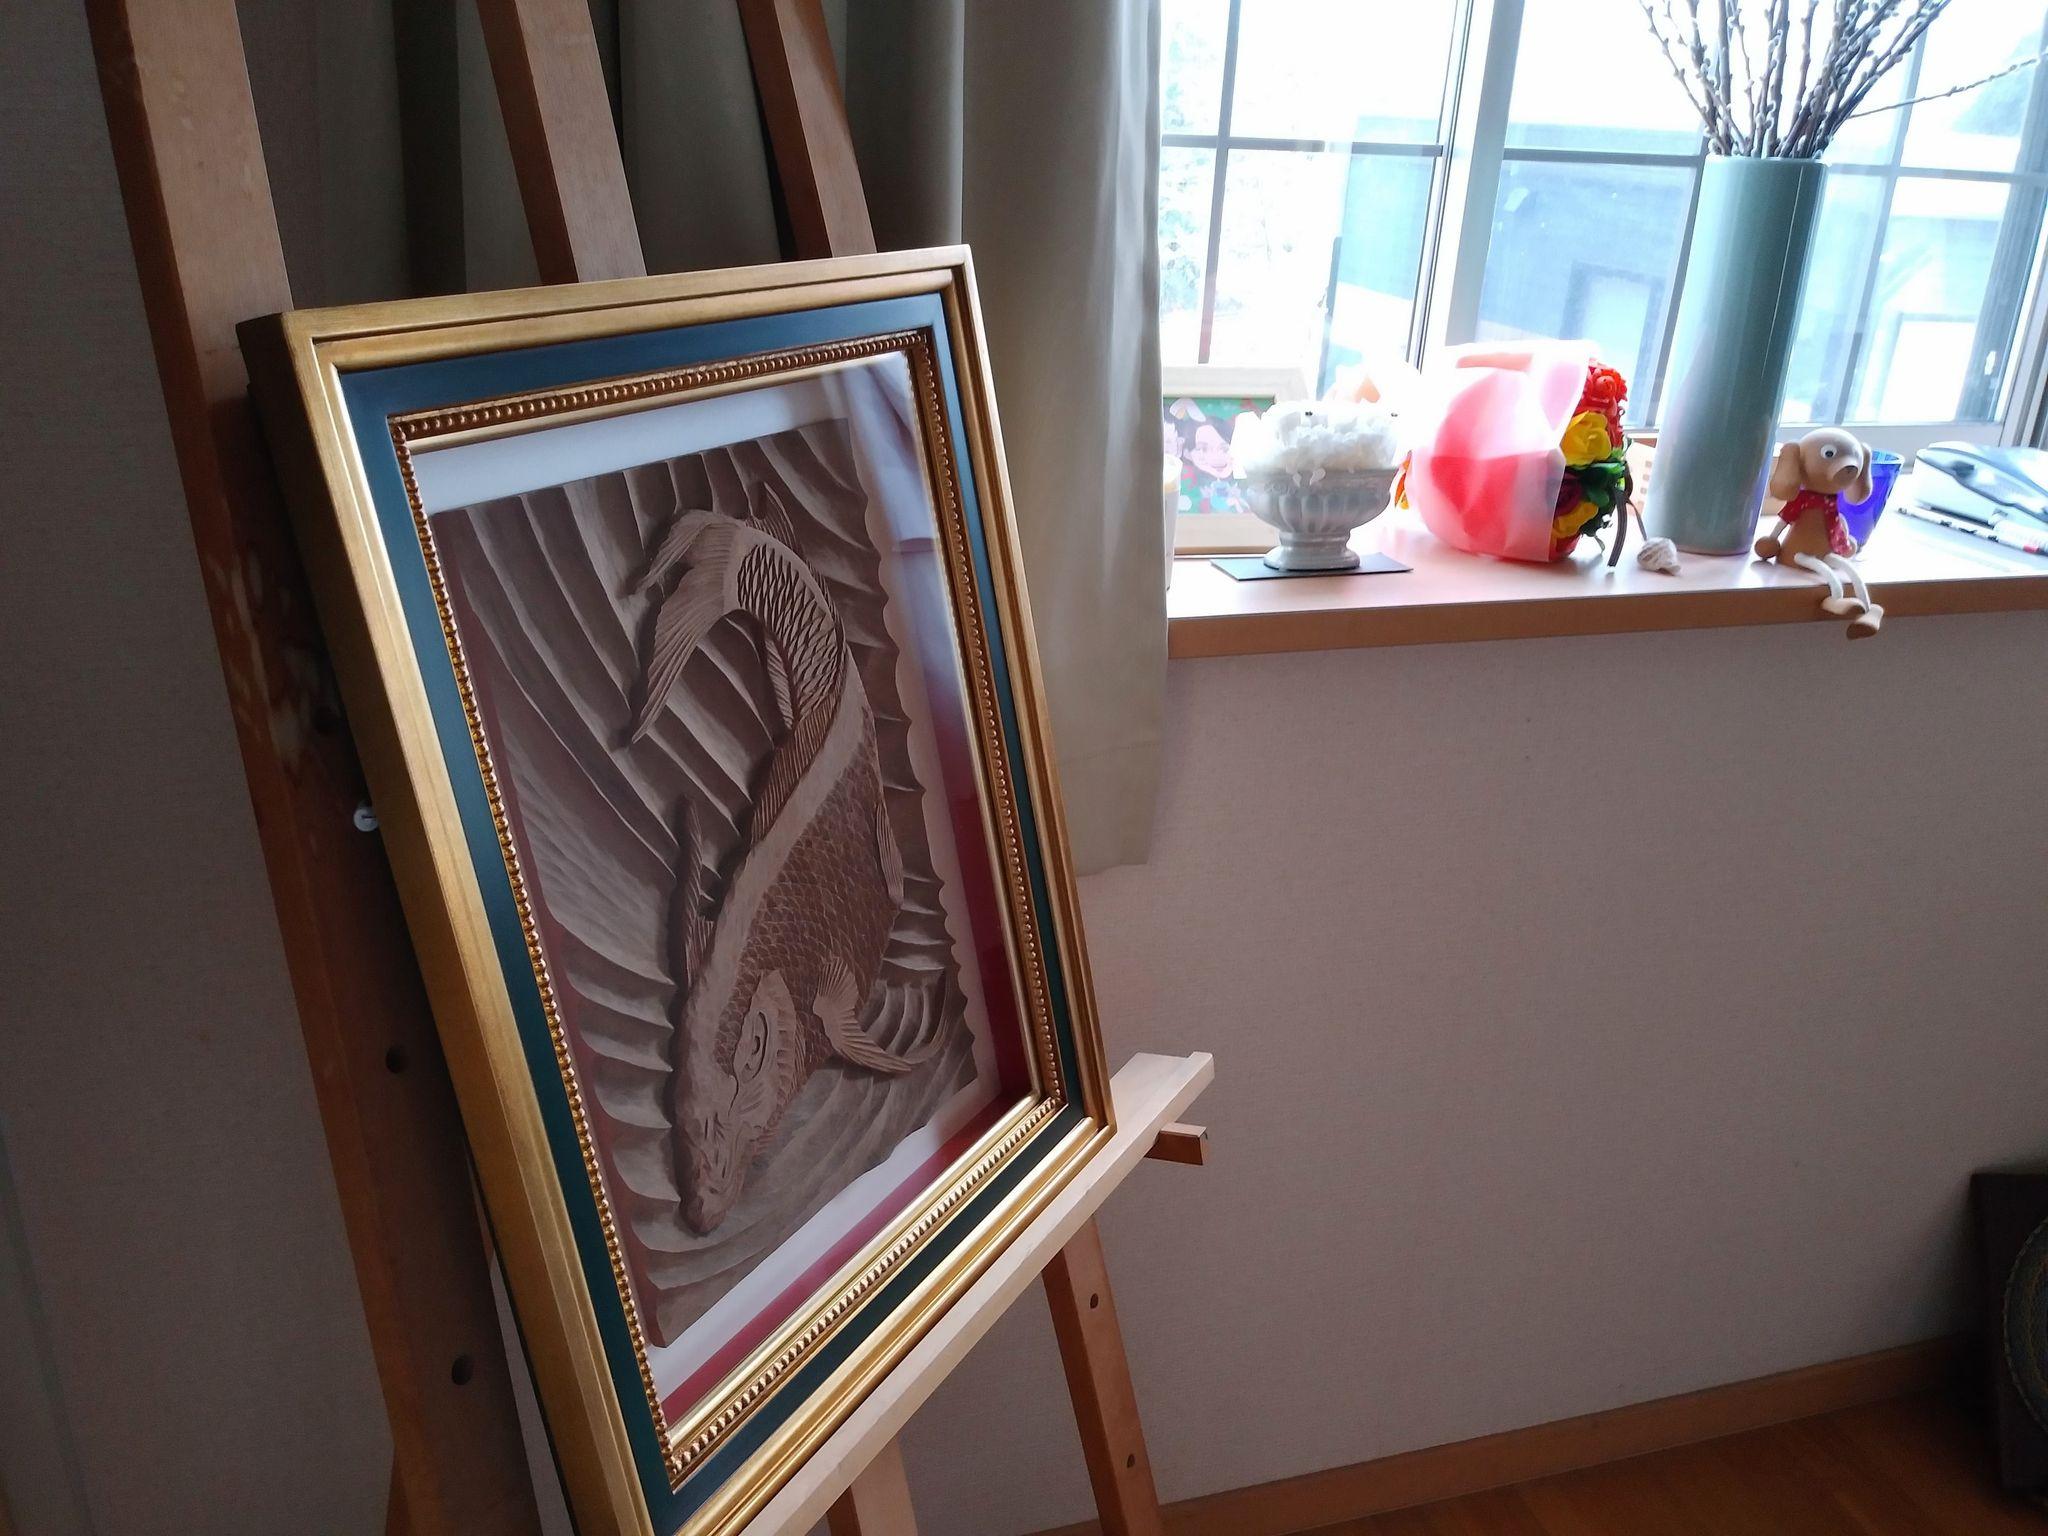 【制作実績】木彫作品『鯉から龍』完成6